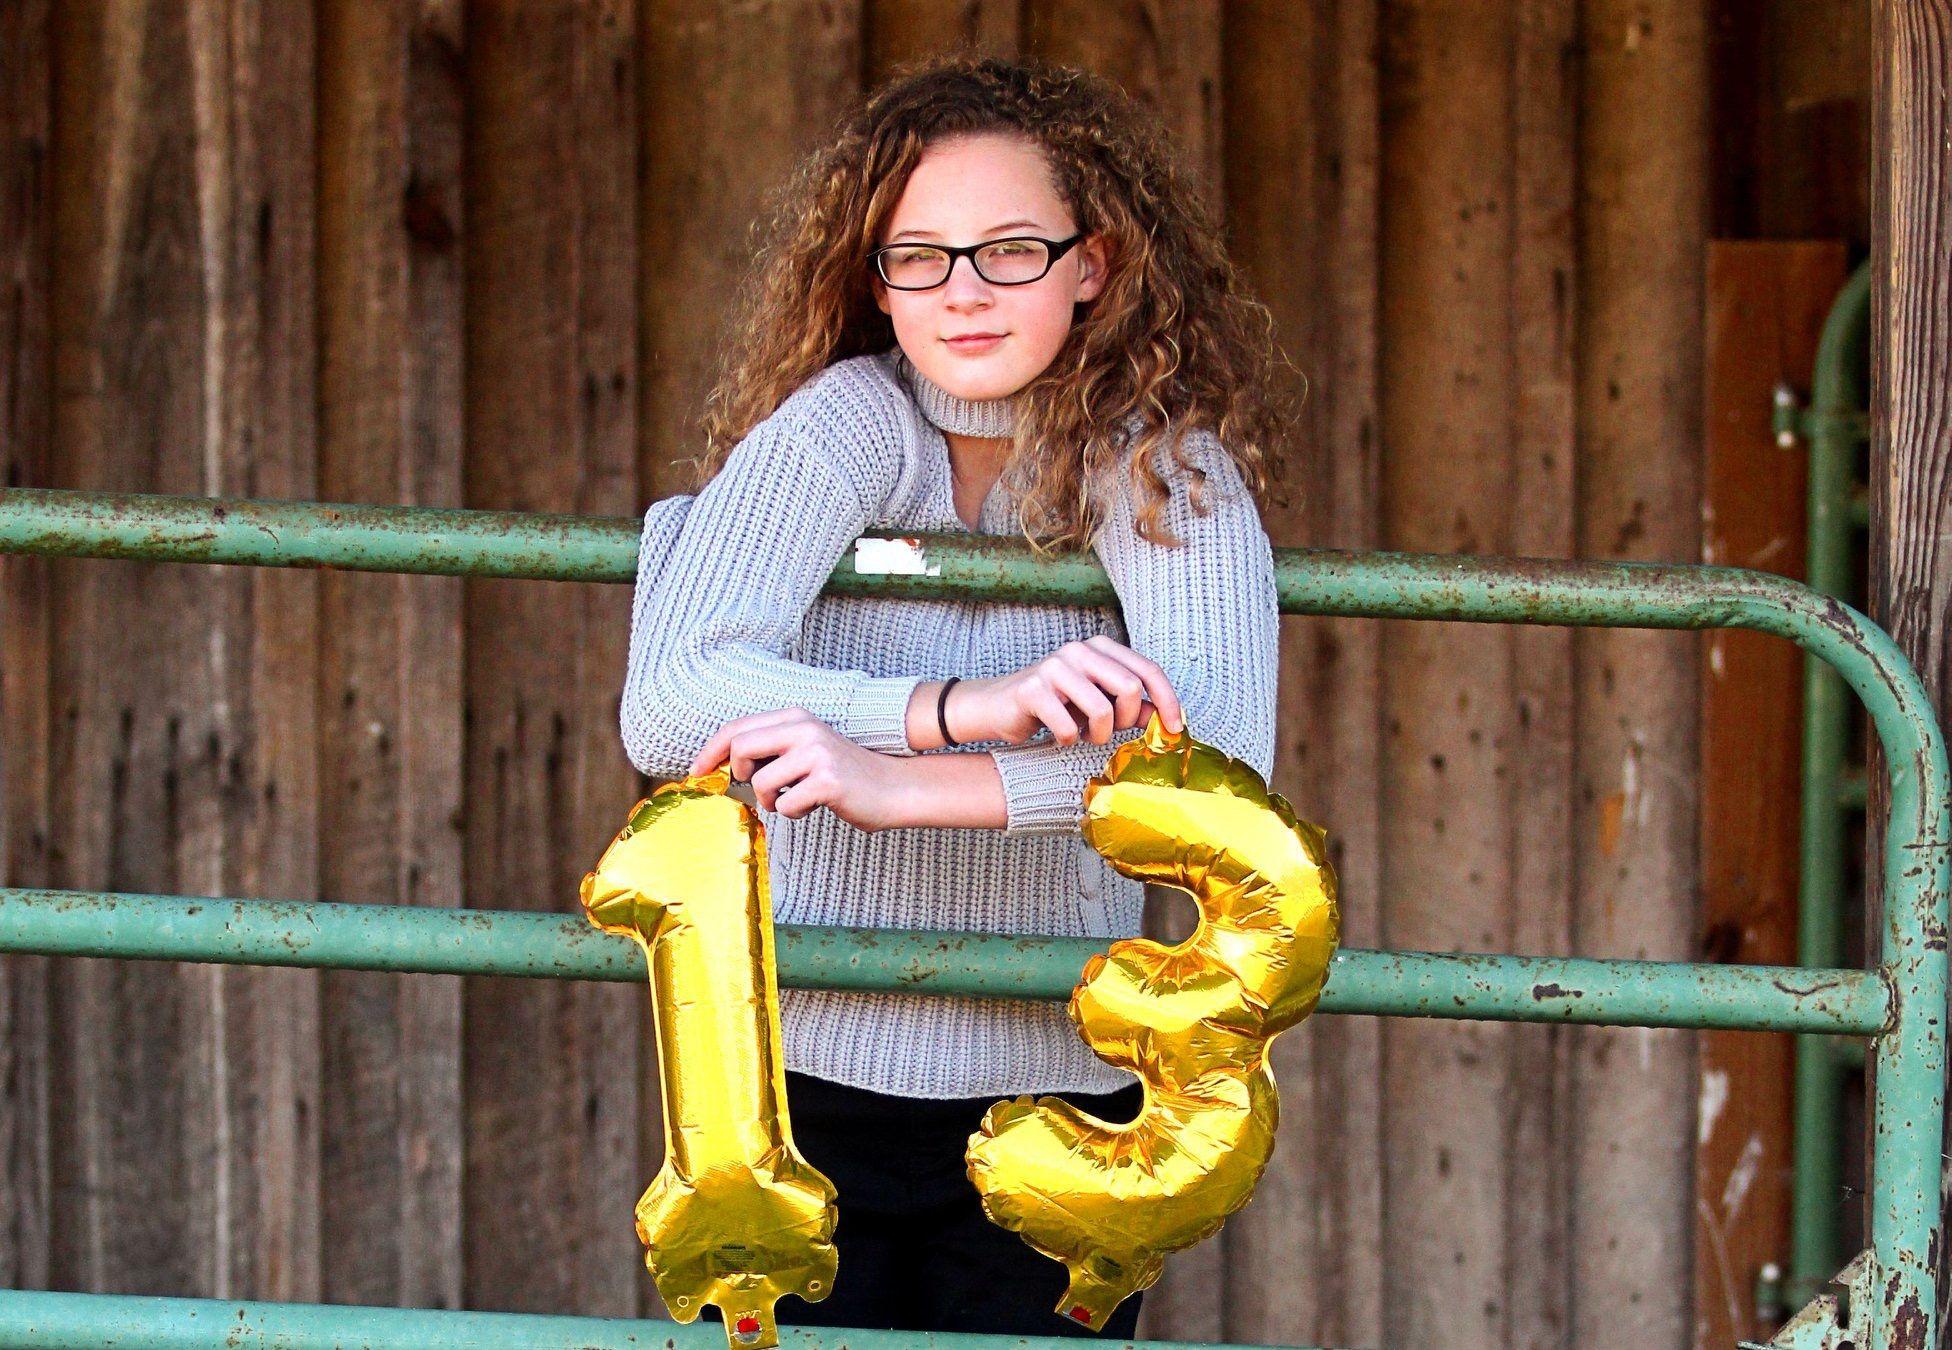 13th birthday 13th birthday photography outdoor decor